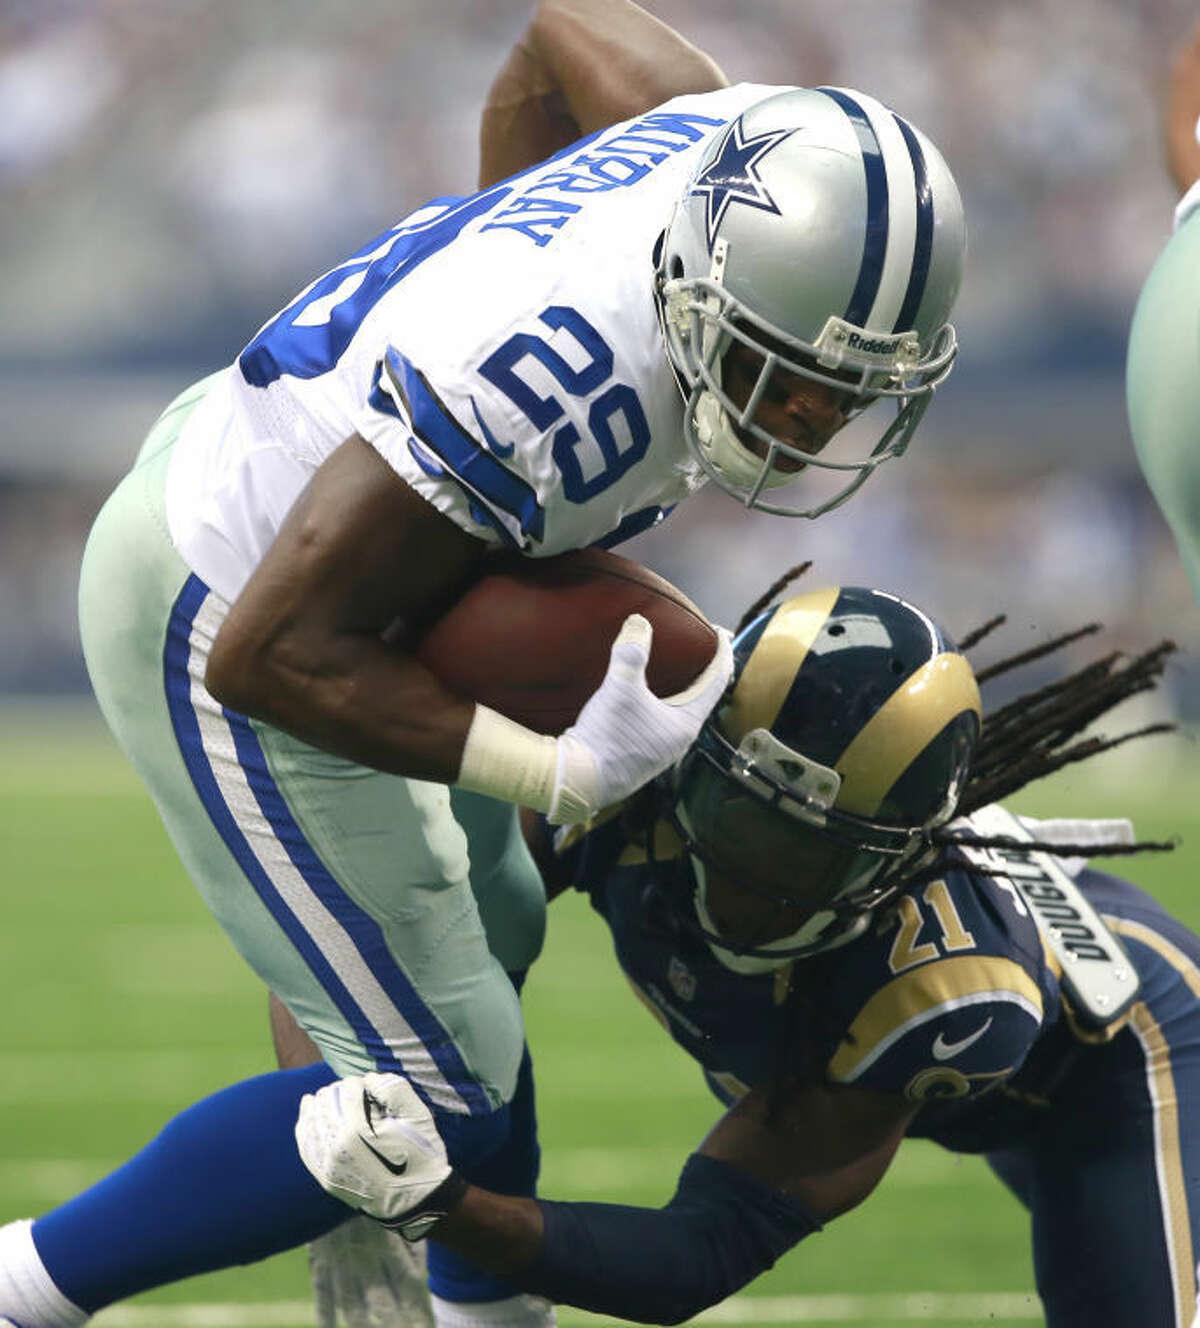 Dallas Cowboys running back DeMarco Murray (29) is tackled by St. Louis Rams cornerback Janoris Jenkins (21) Sunday in Arlington.(AP Photo/Waco Tribune Herald, Jose Yau)